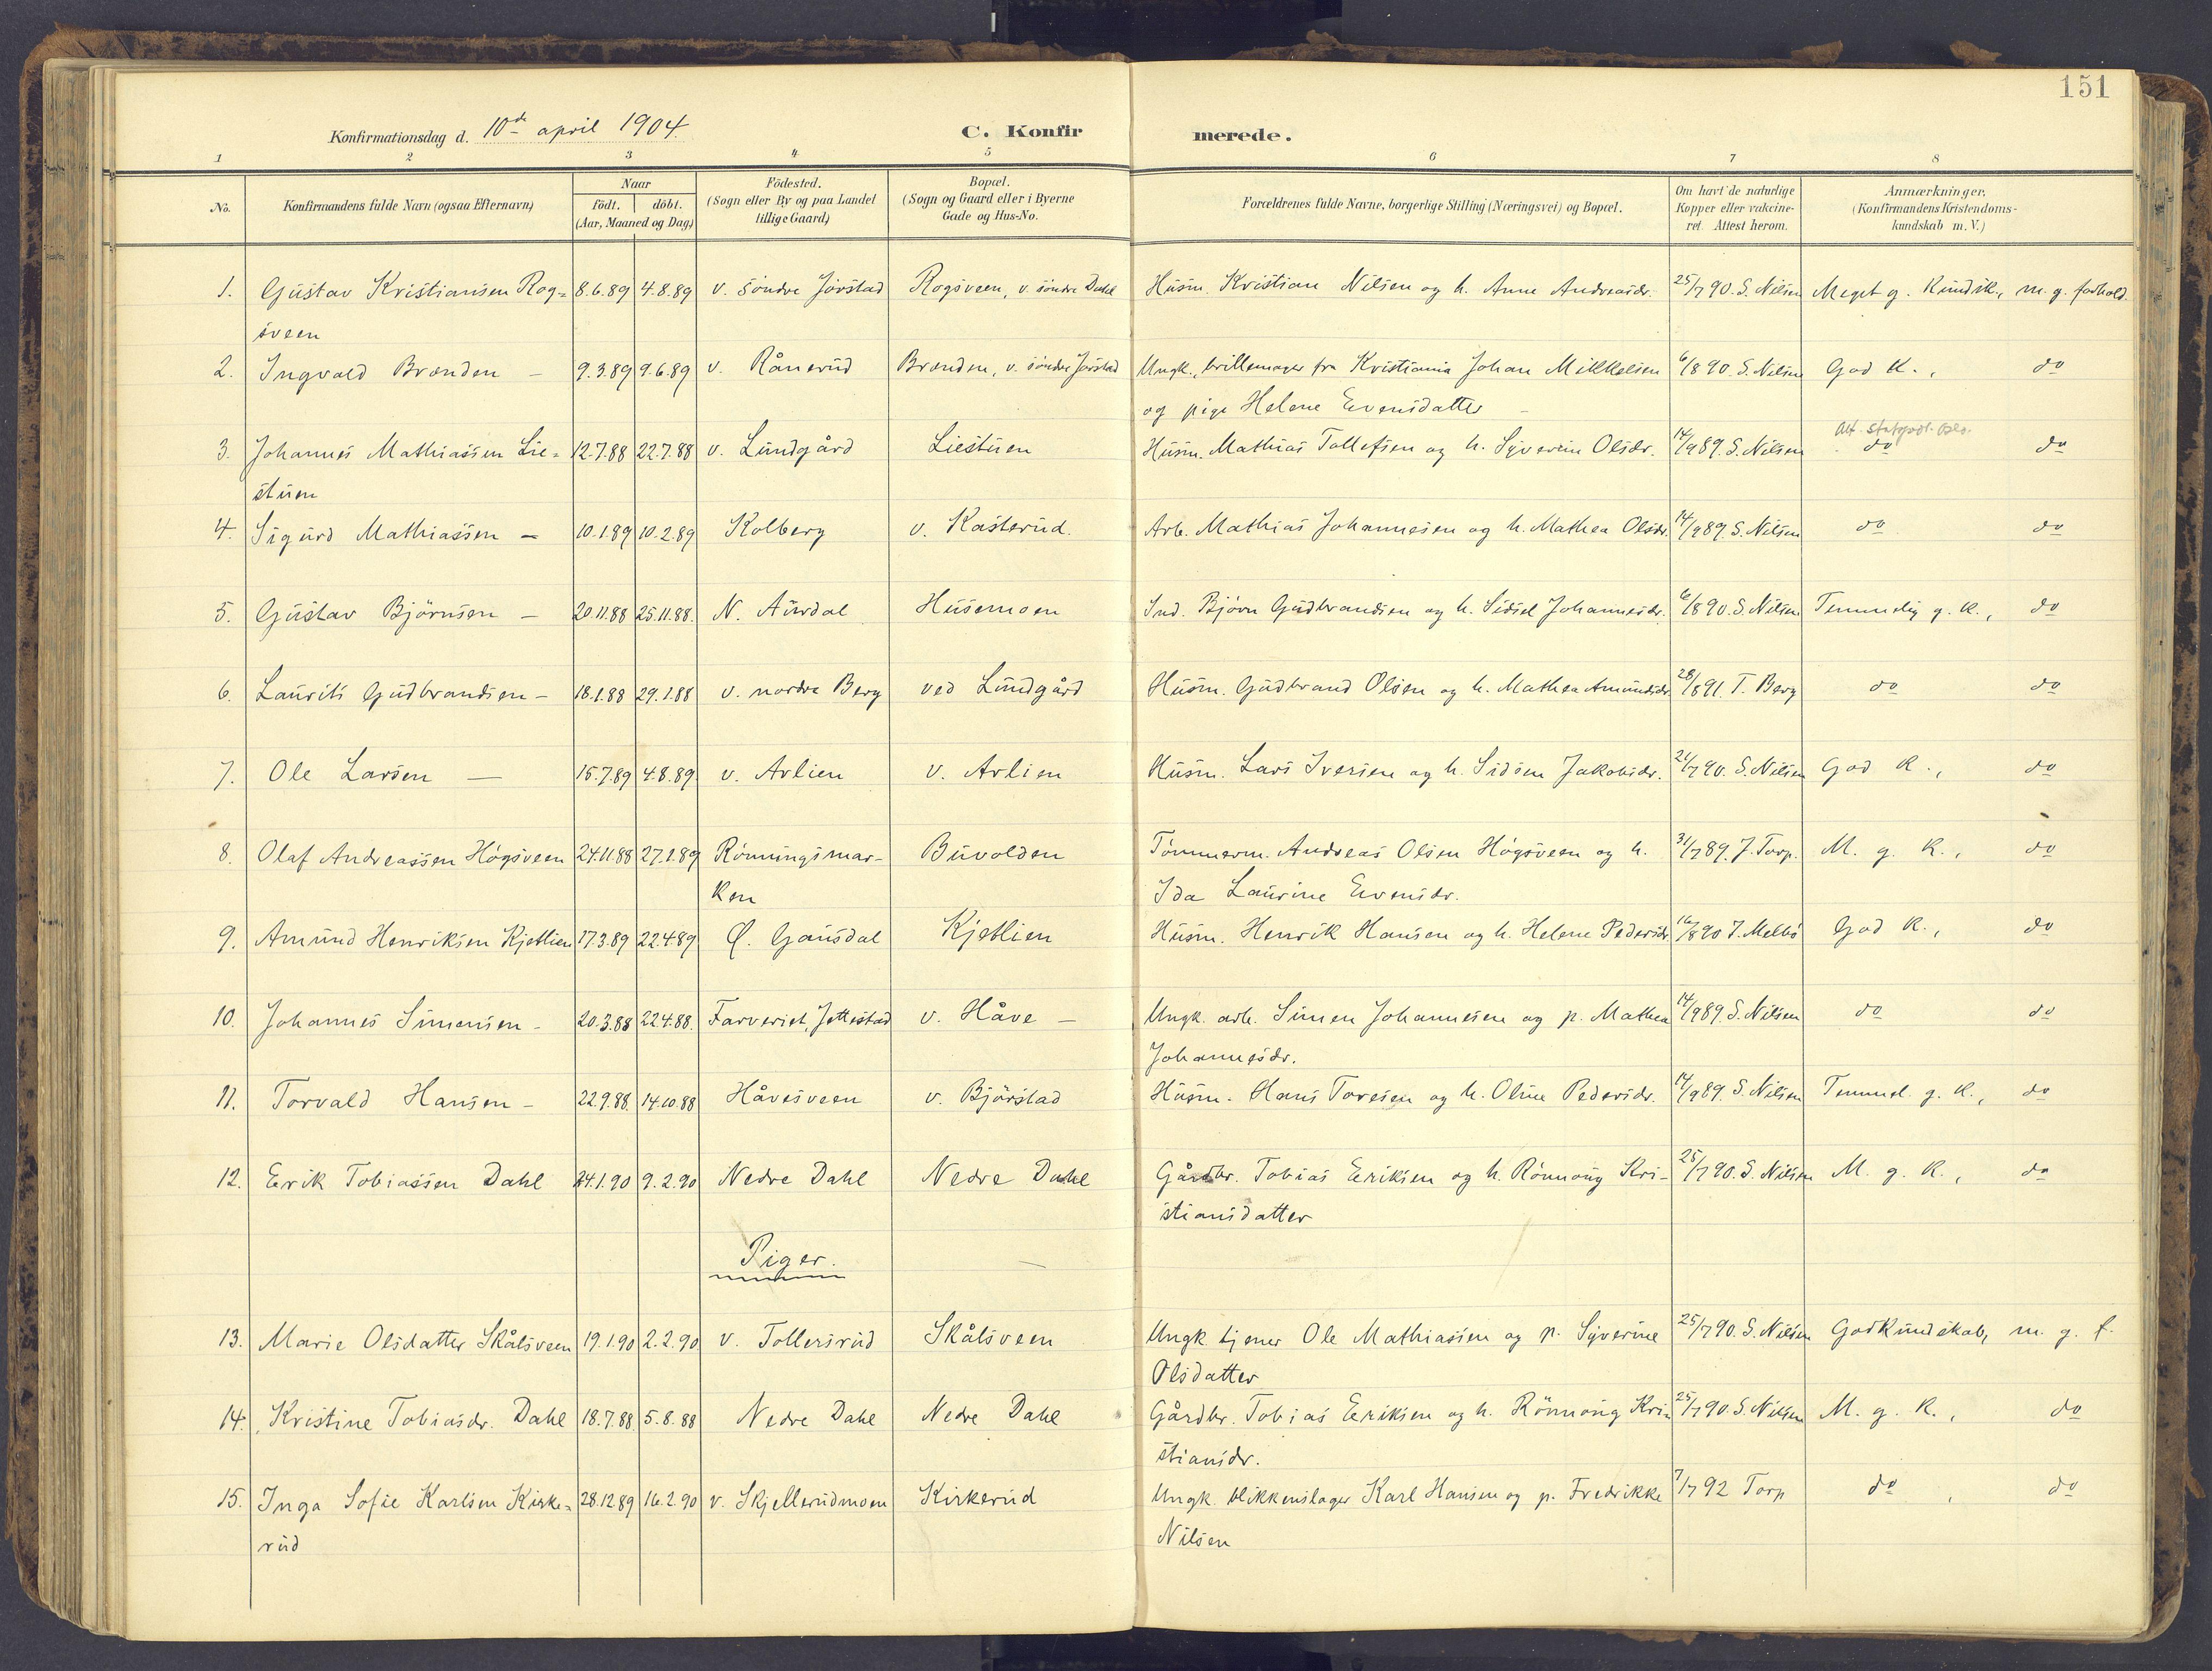 SAH, Fåberg prestekontor, Ministerialbok nr. 12, 1899-1915, s. 151